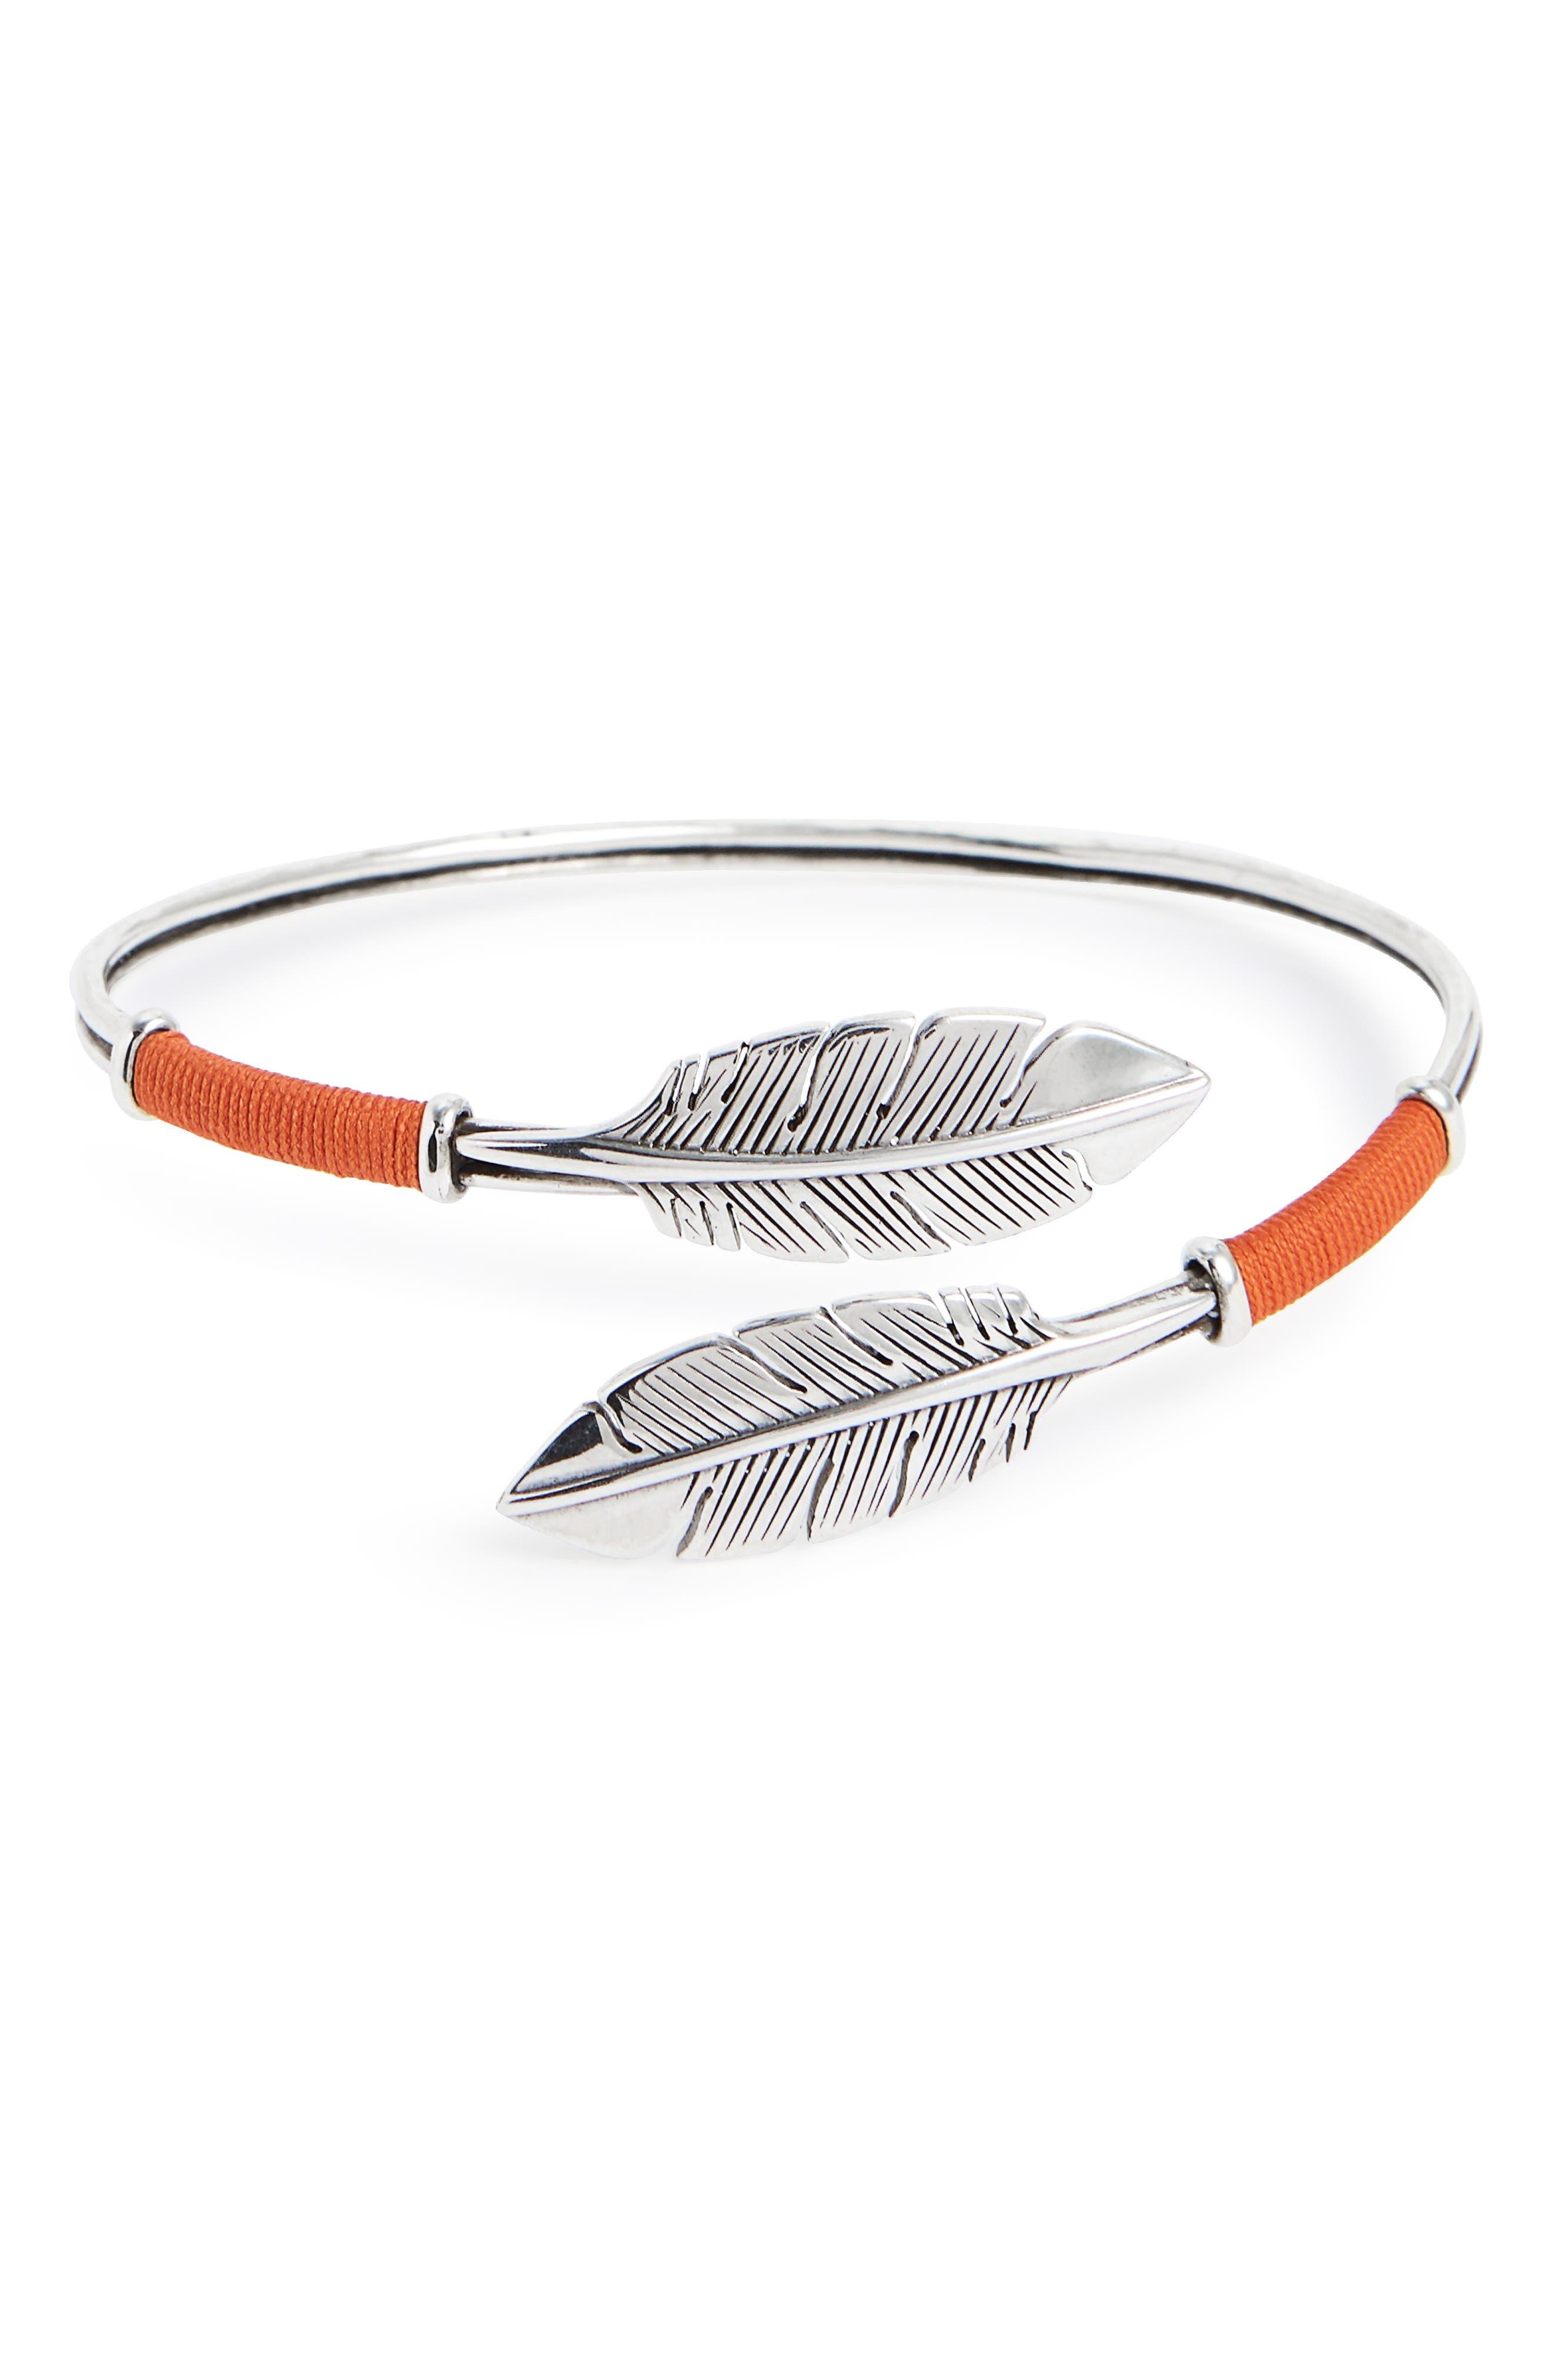 Duality Penna Cuff Bracelet,                             Main thumbnail 1, color,                             040